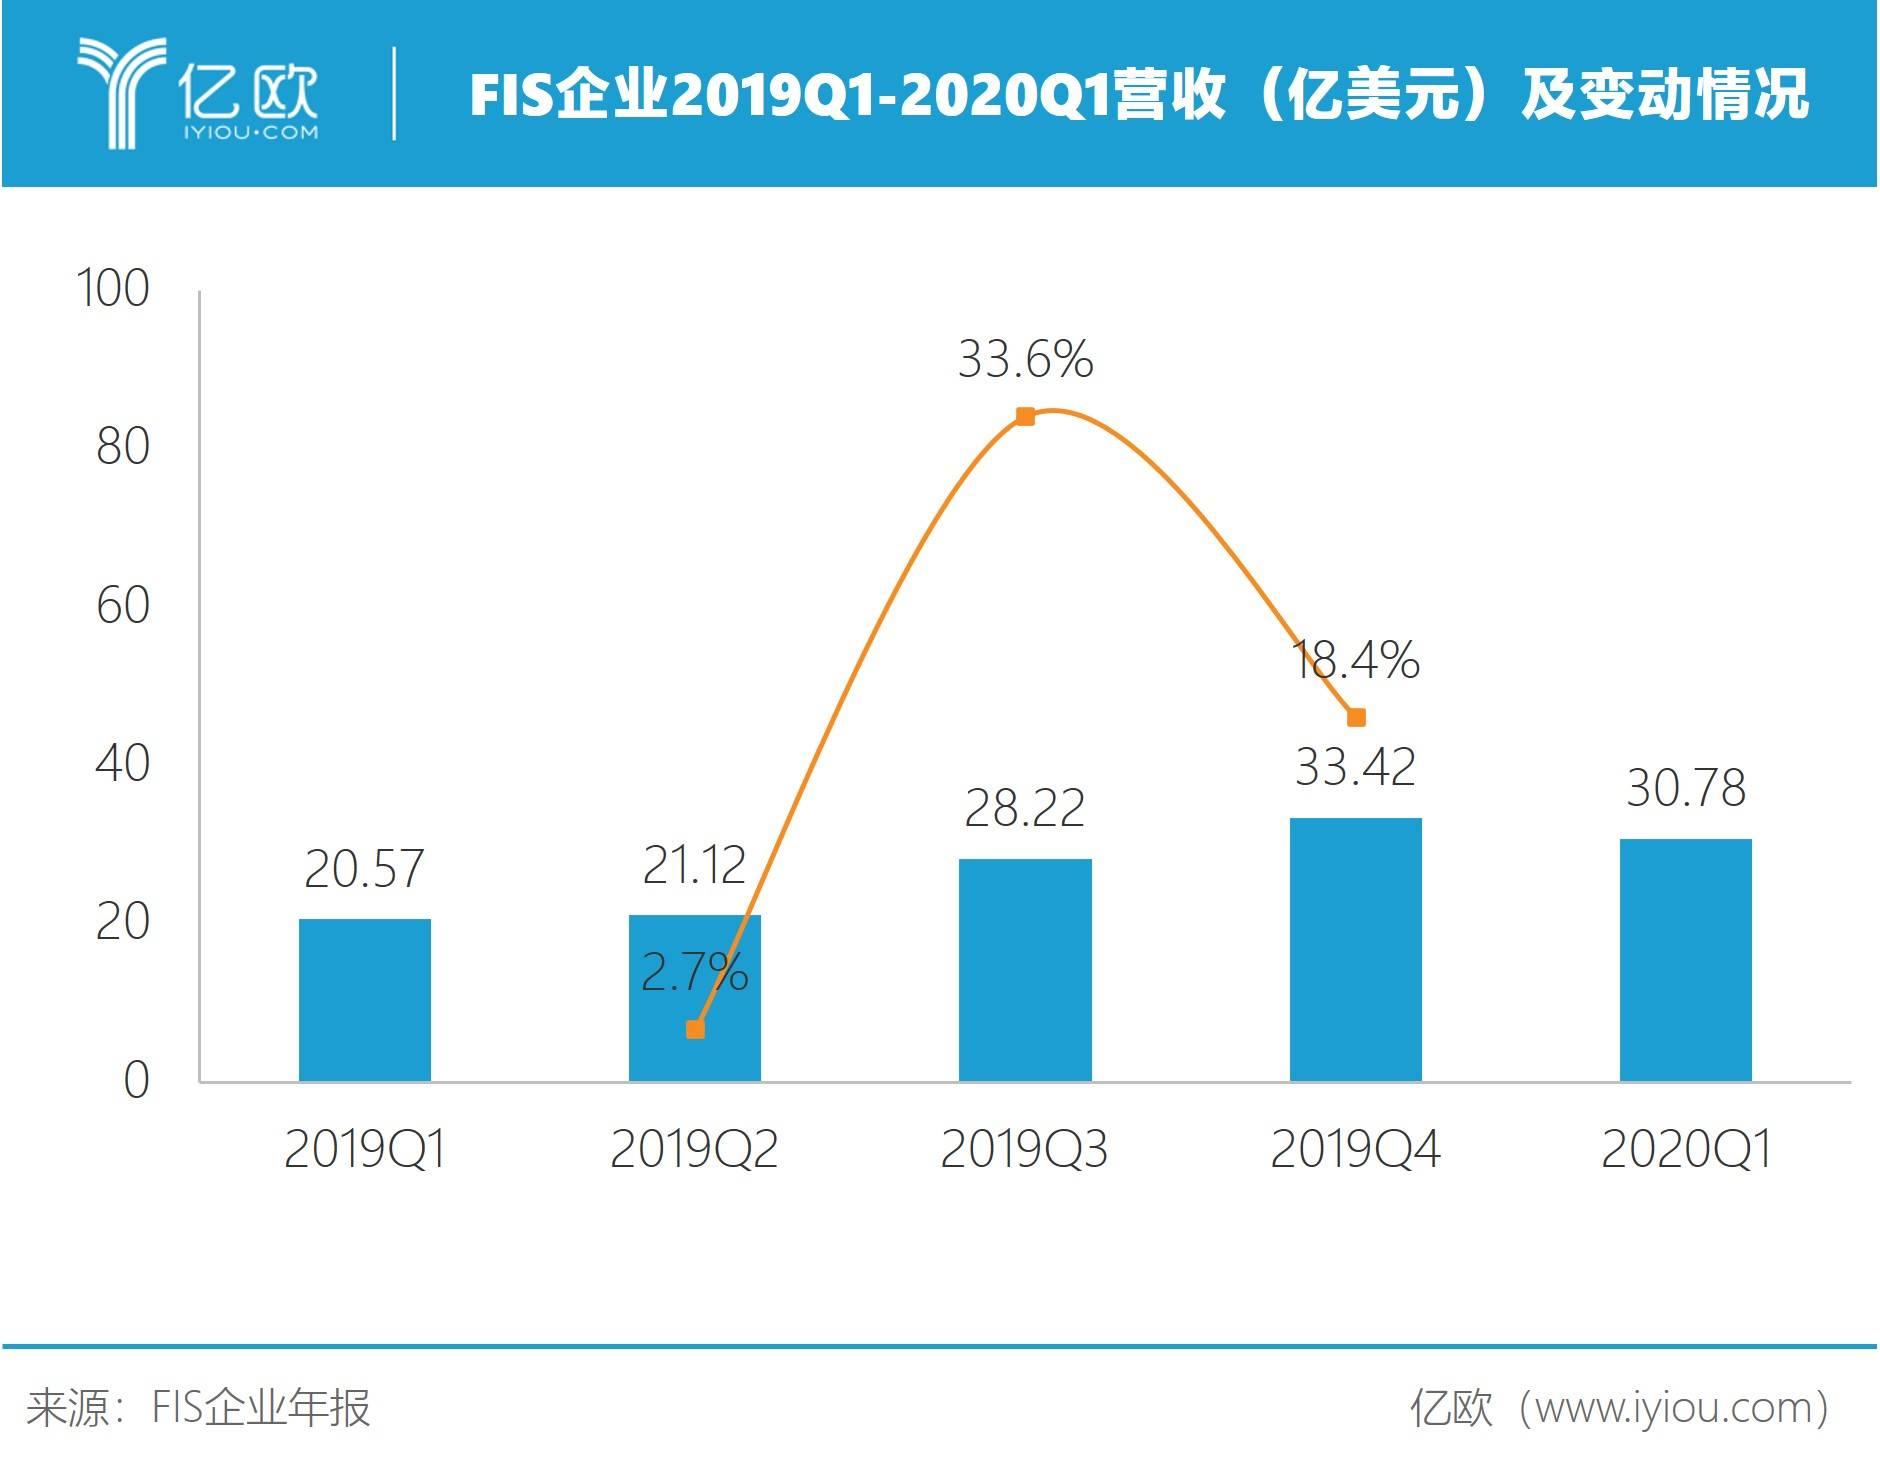 FIS企业2019Q1-2020Q1营收(亿美元)及转折情况